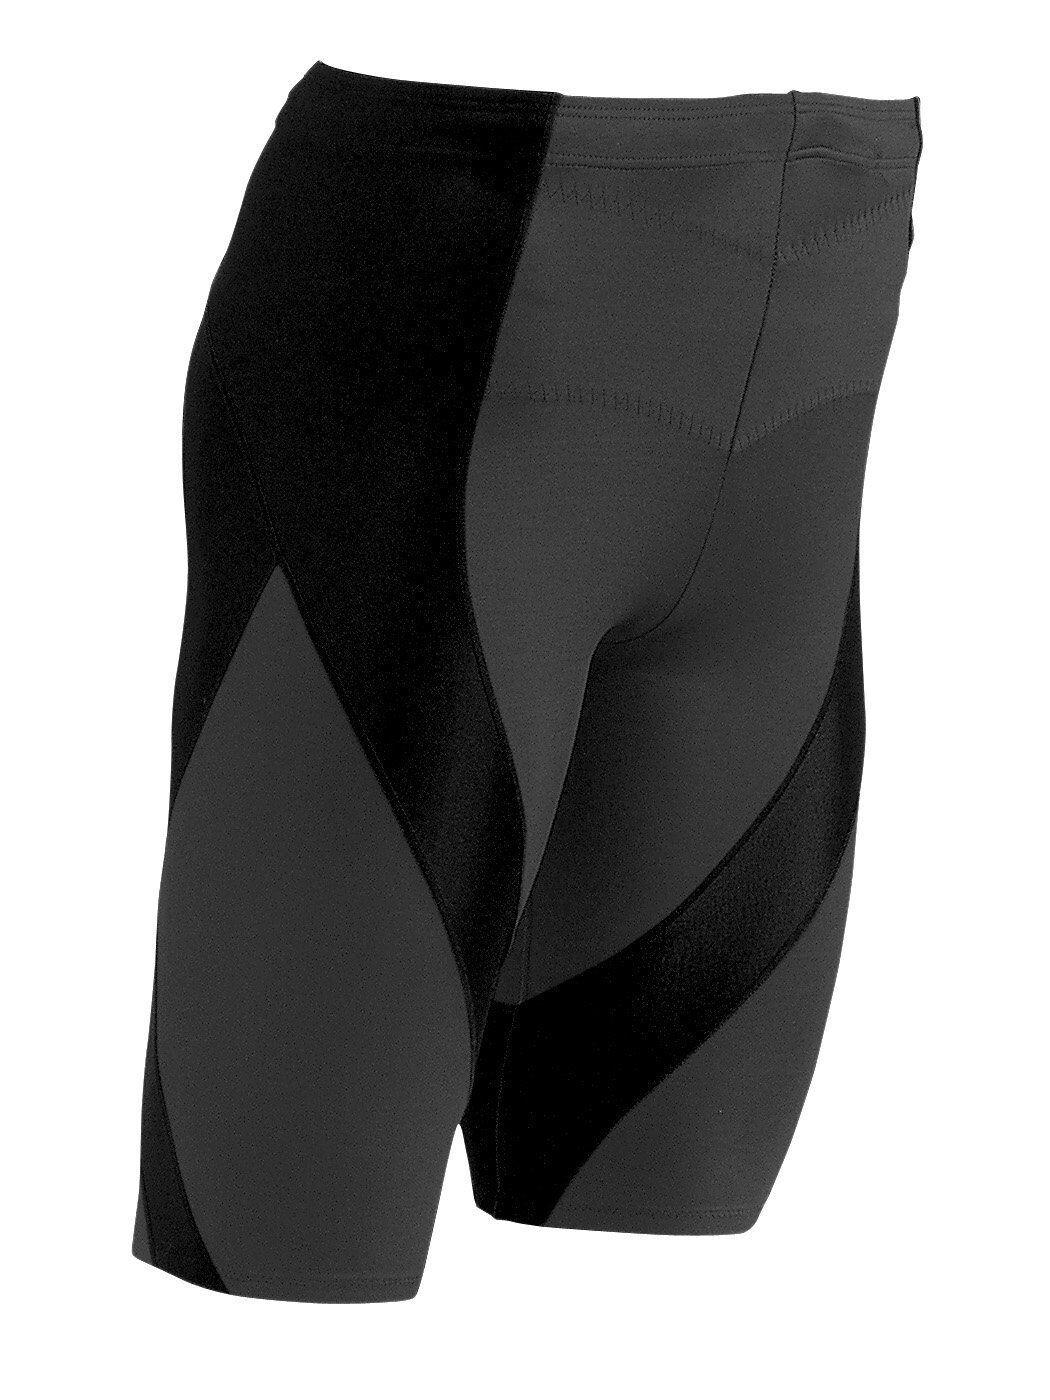 CW-X Konditionierung Herren Pro Shorts 240805 2017 NEU